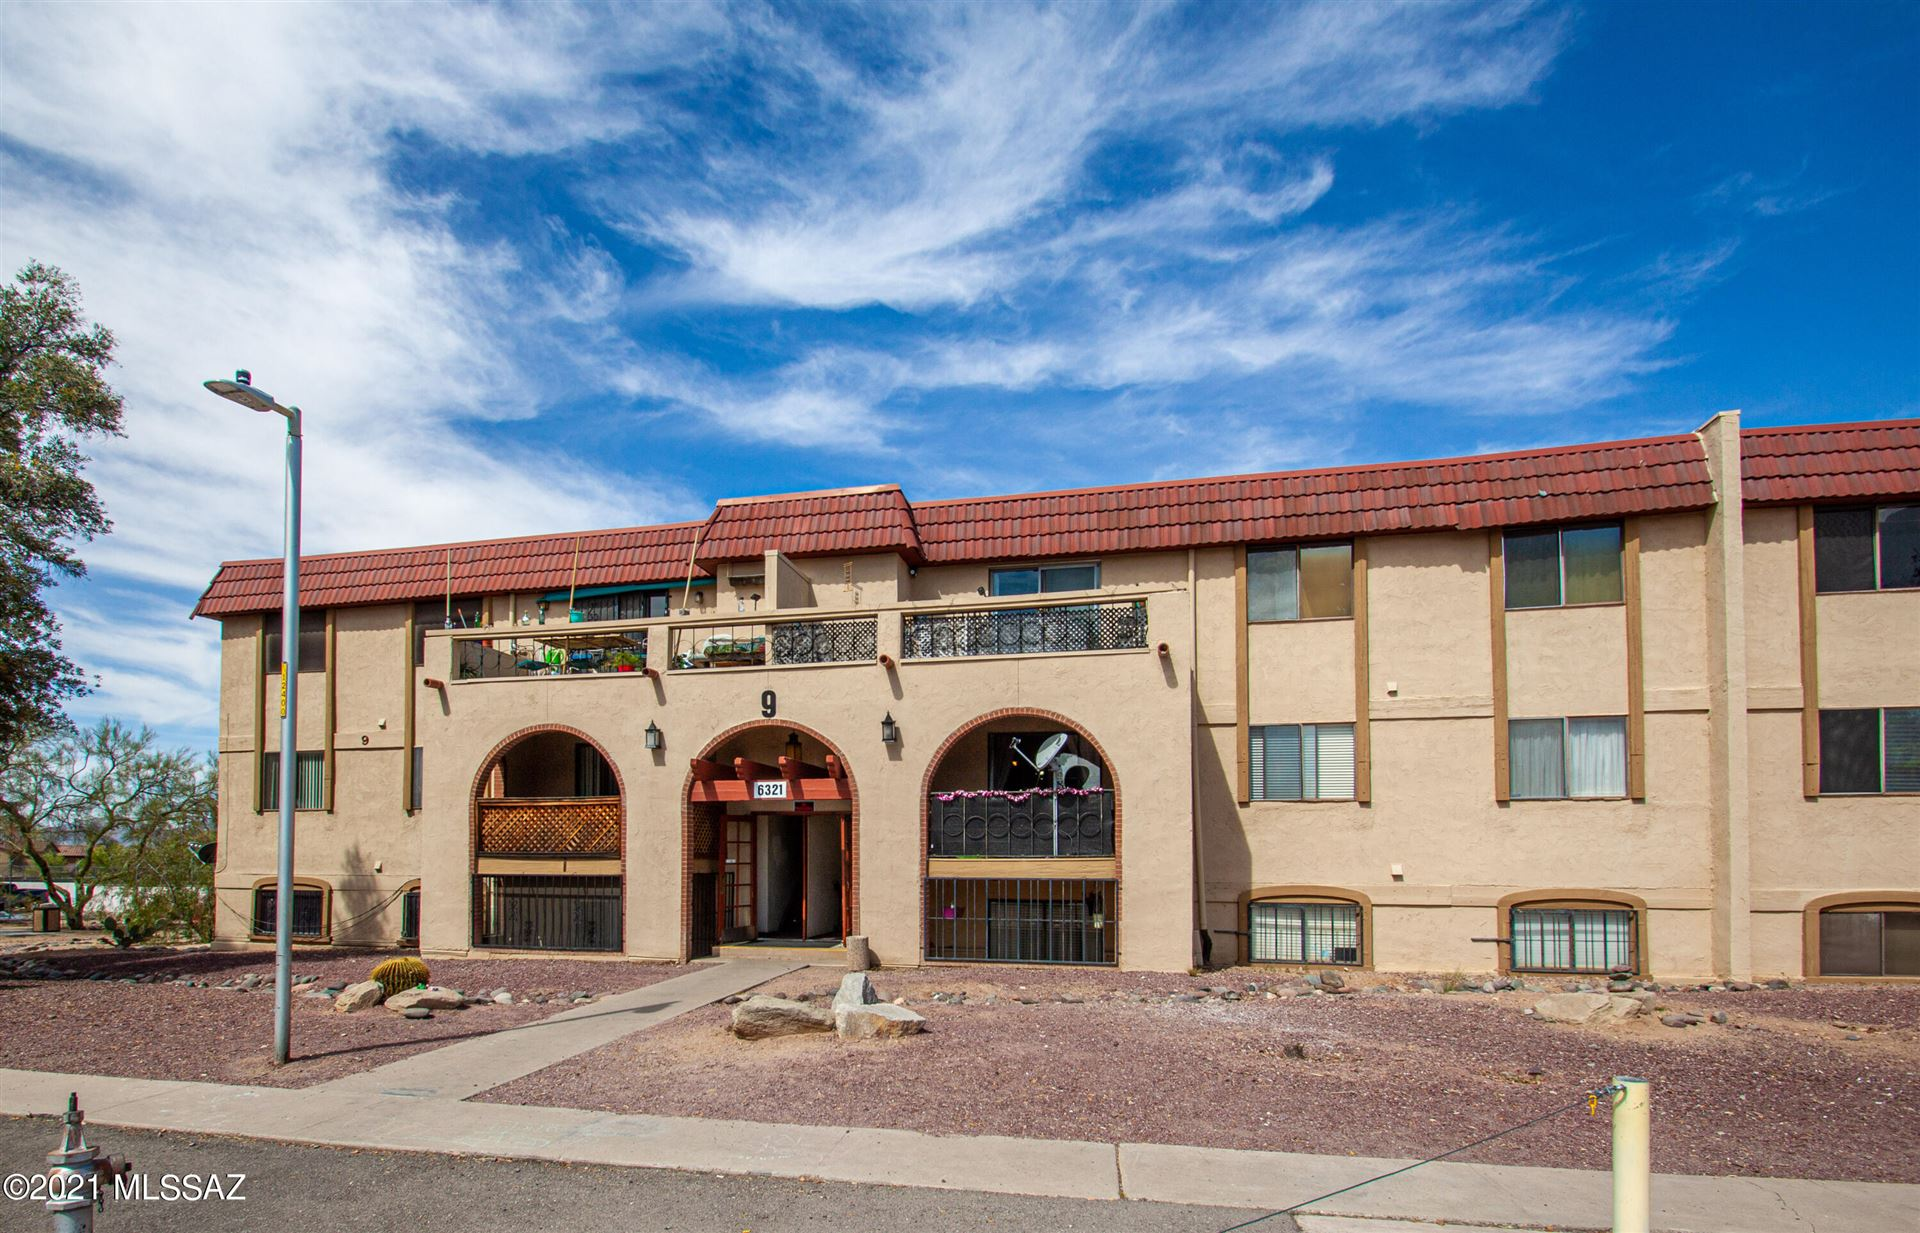 6321 N Barcelona Court #907, Tucson, AZ 85704 - MLS#: 22109924